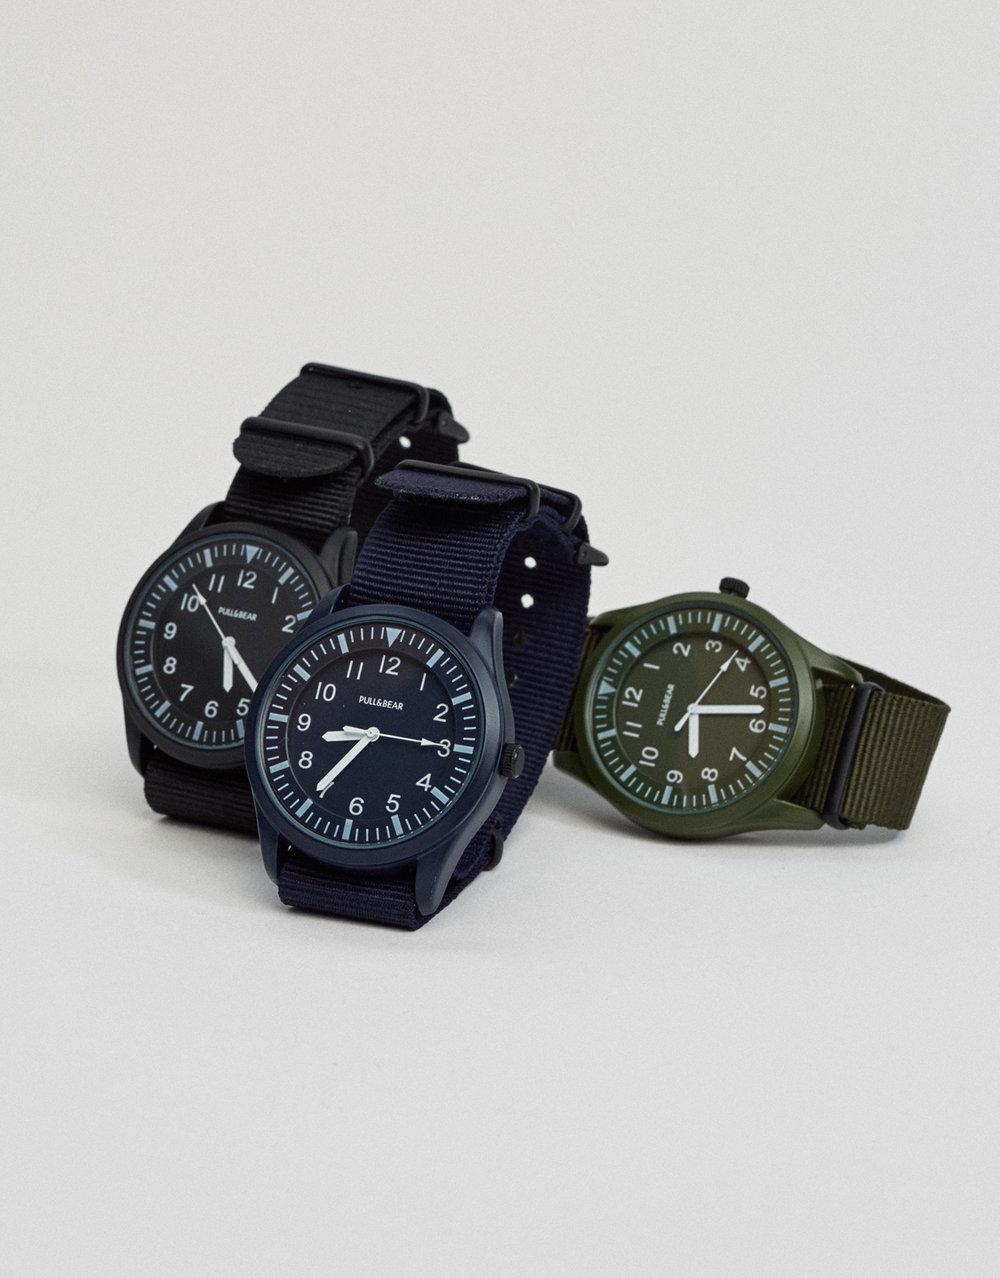 Nylon-Casual-Watch-Pull-Bear-1599€.jpg